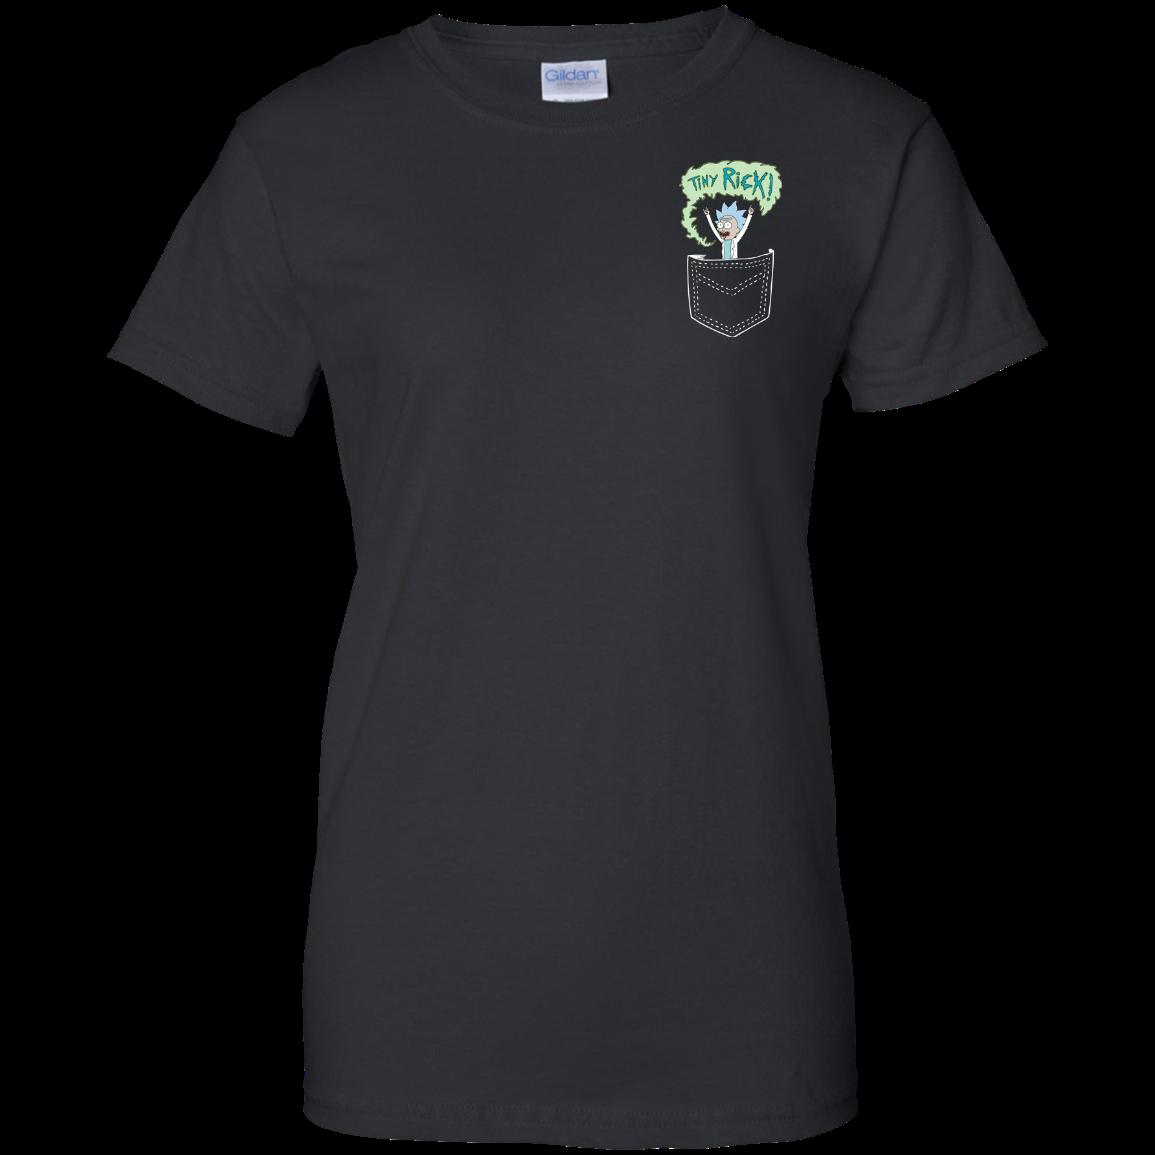 image 905px Rick and Morty: Tiny Rick Pocket T Shirt